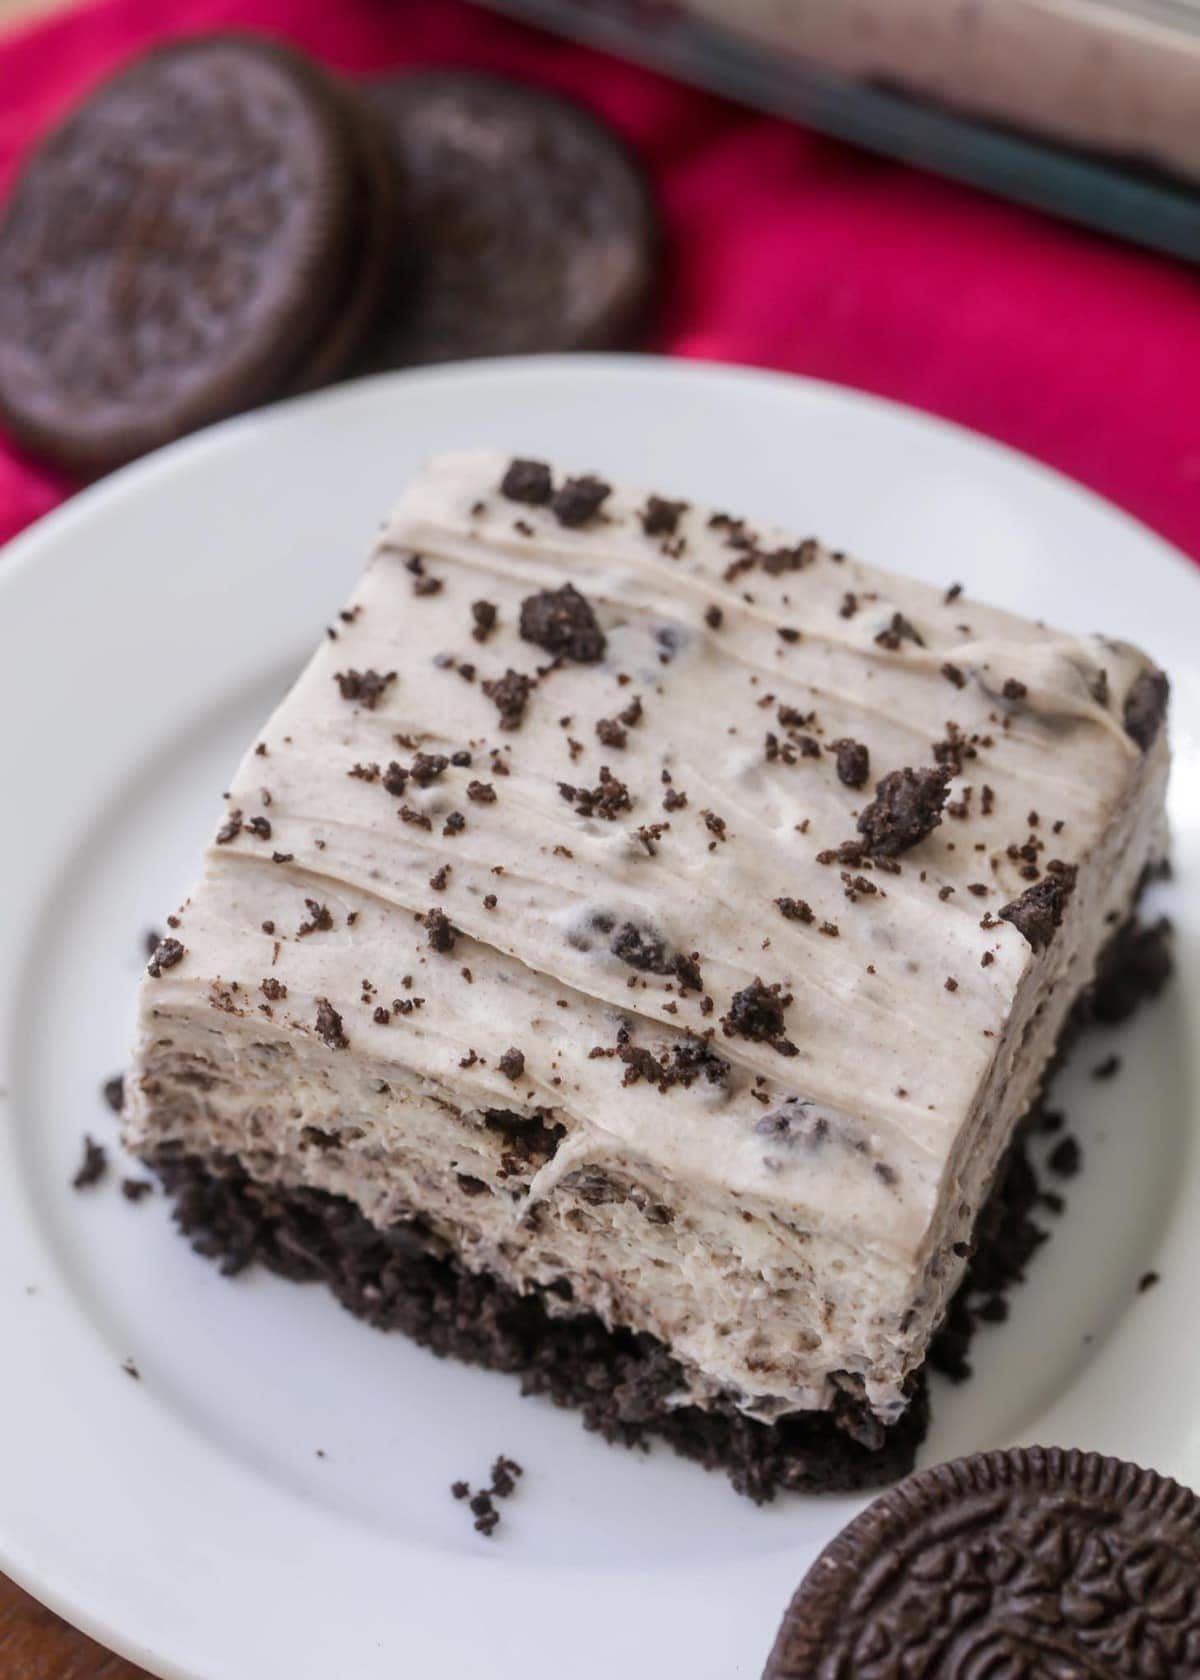 Oreo Cheesecake slice on a plate